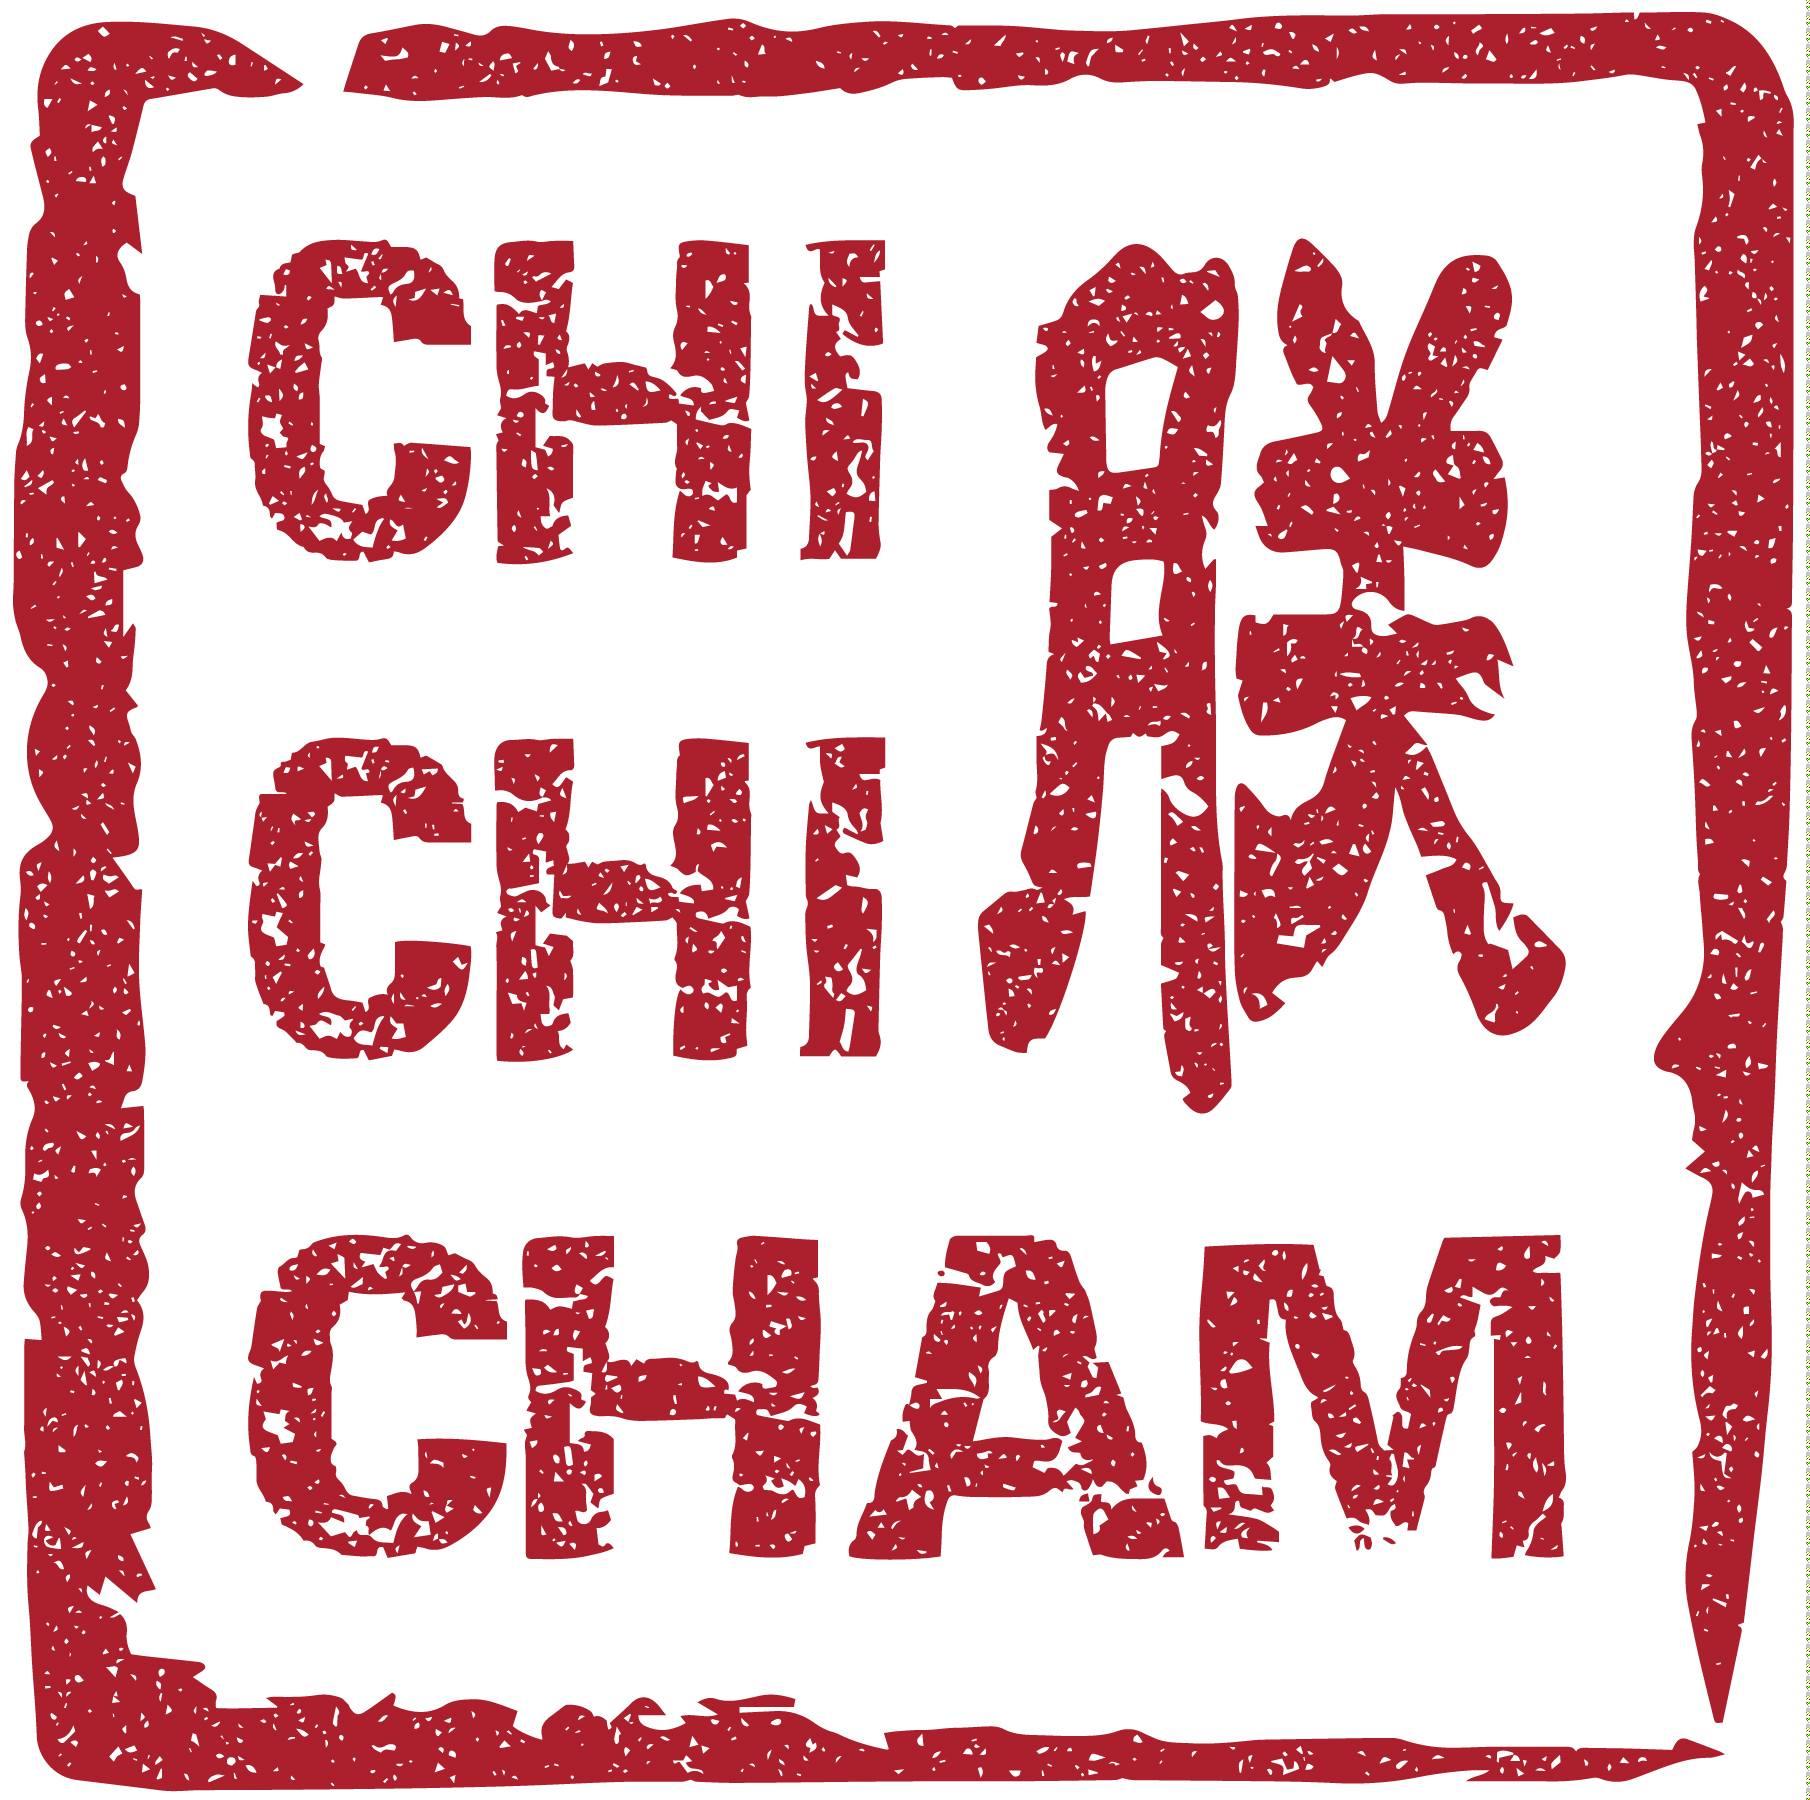 Chi Chi Cham